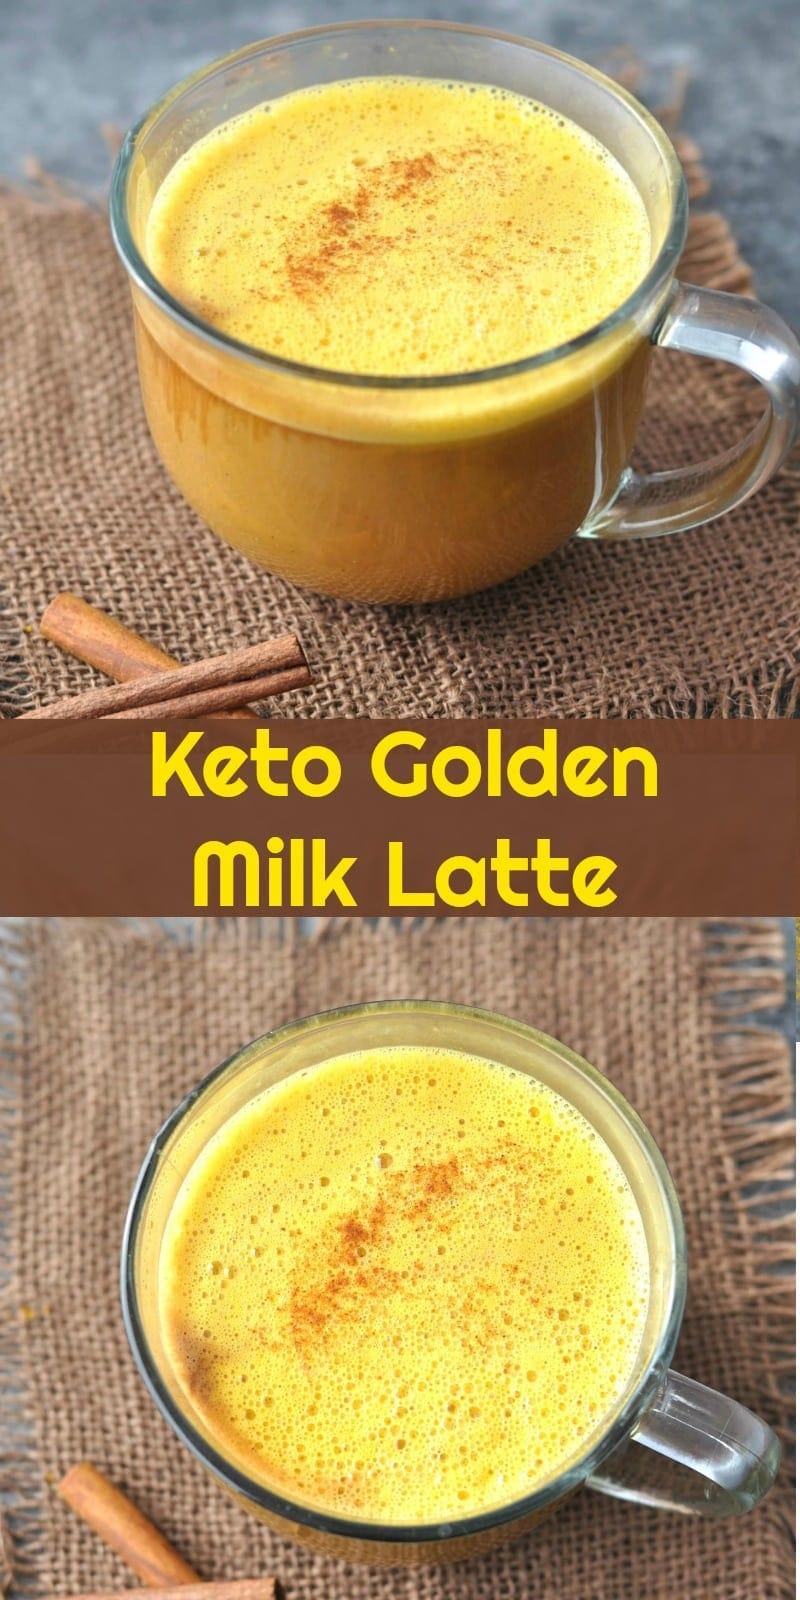 Keto Golden Milk Latte Turmeric Tea | Peace Love and Low Carb